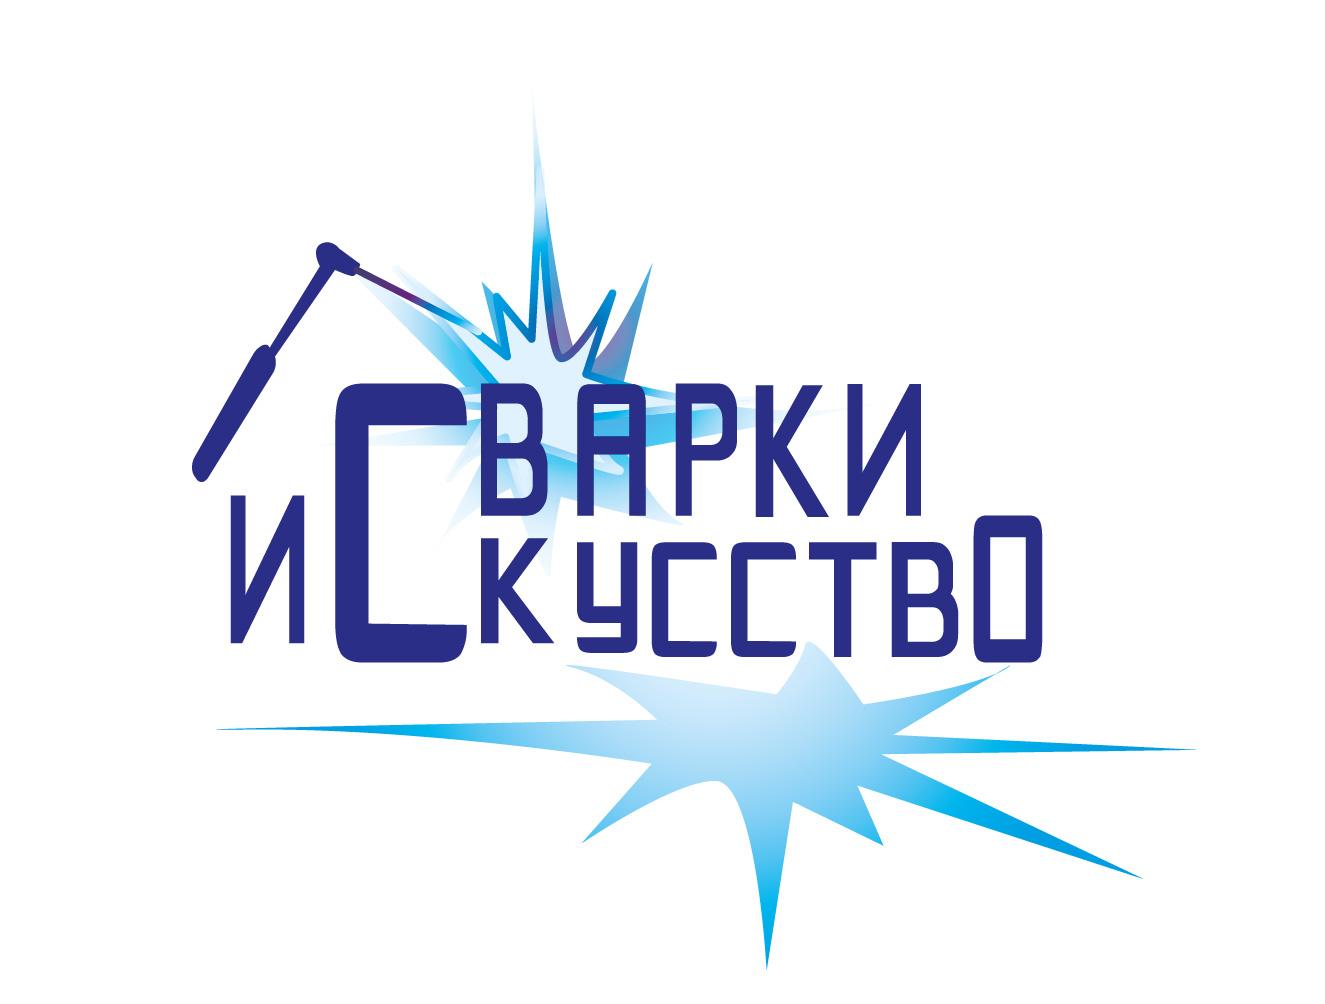 Разработка логотипа для Конкурса фото f_8125f6e3bfedb251.jpg